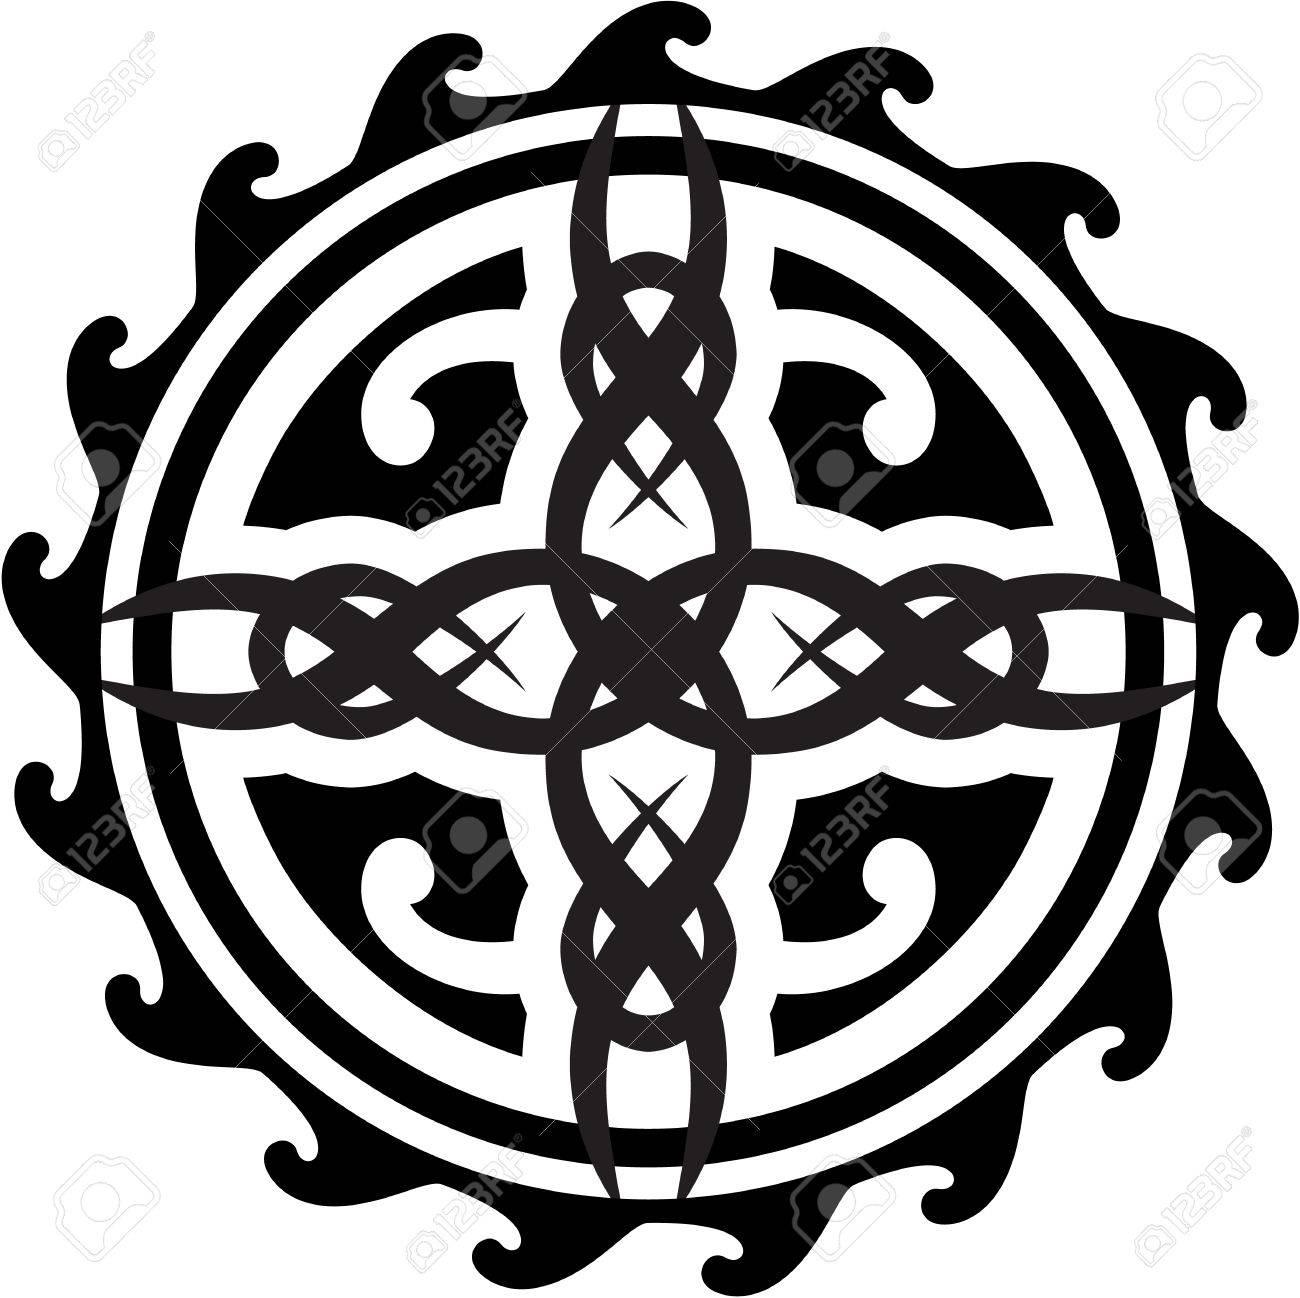 Simbolos Maories Gallery Of Excellent Stunning Interesting - Simbolos-maories